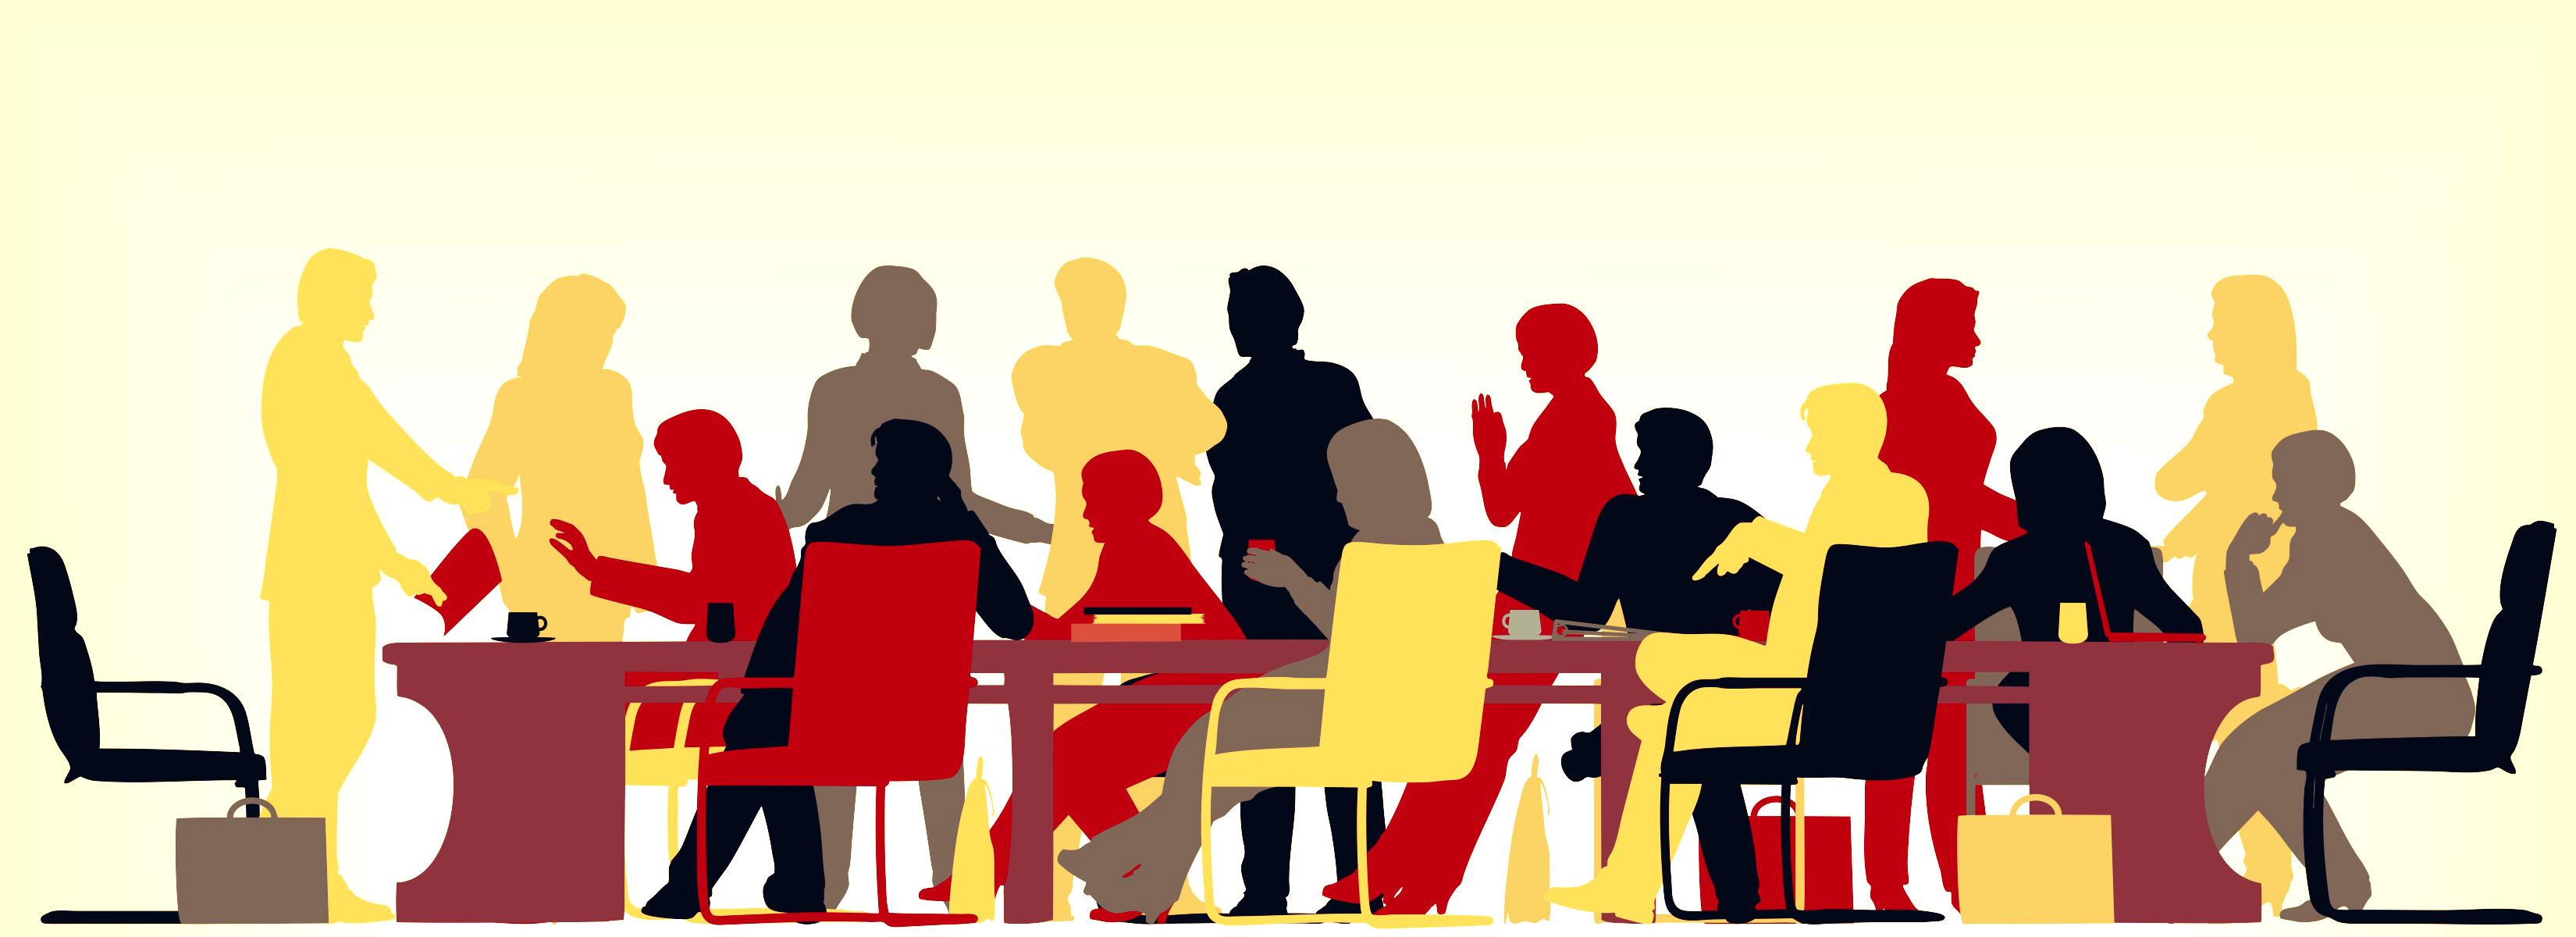 Parent meeting clipart freeuse download Parent Meeting Images | Free download best Parent Meeting ... freeuse download